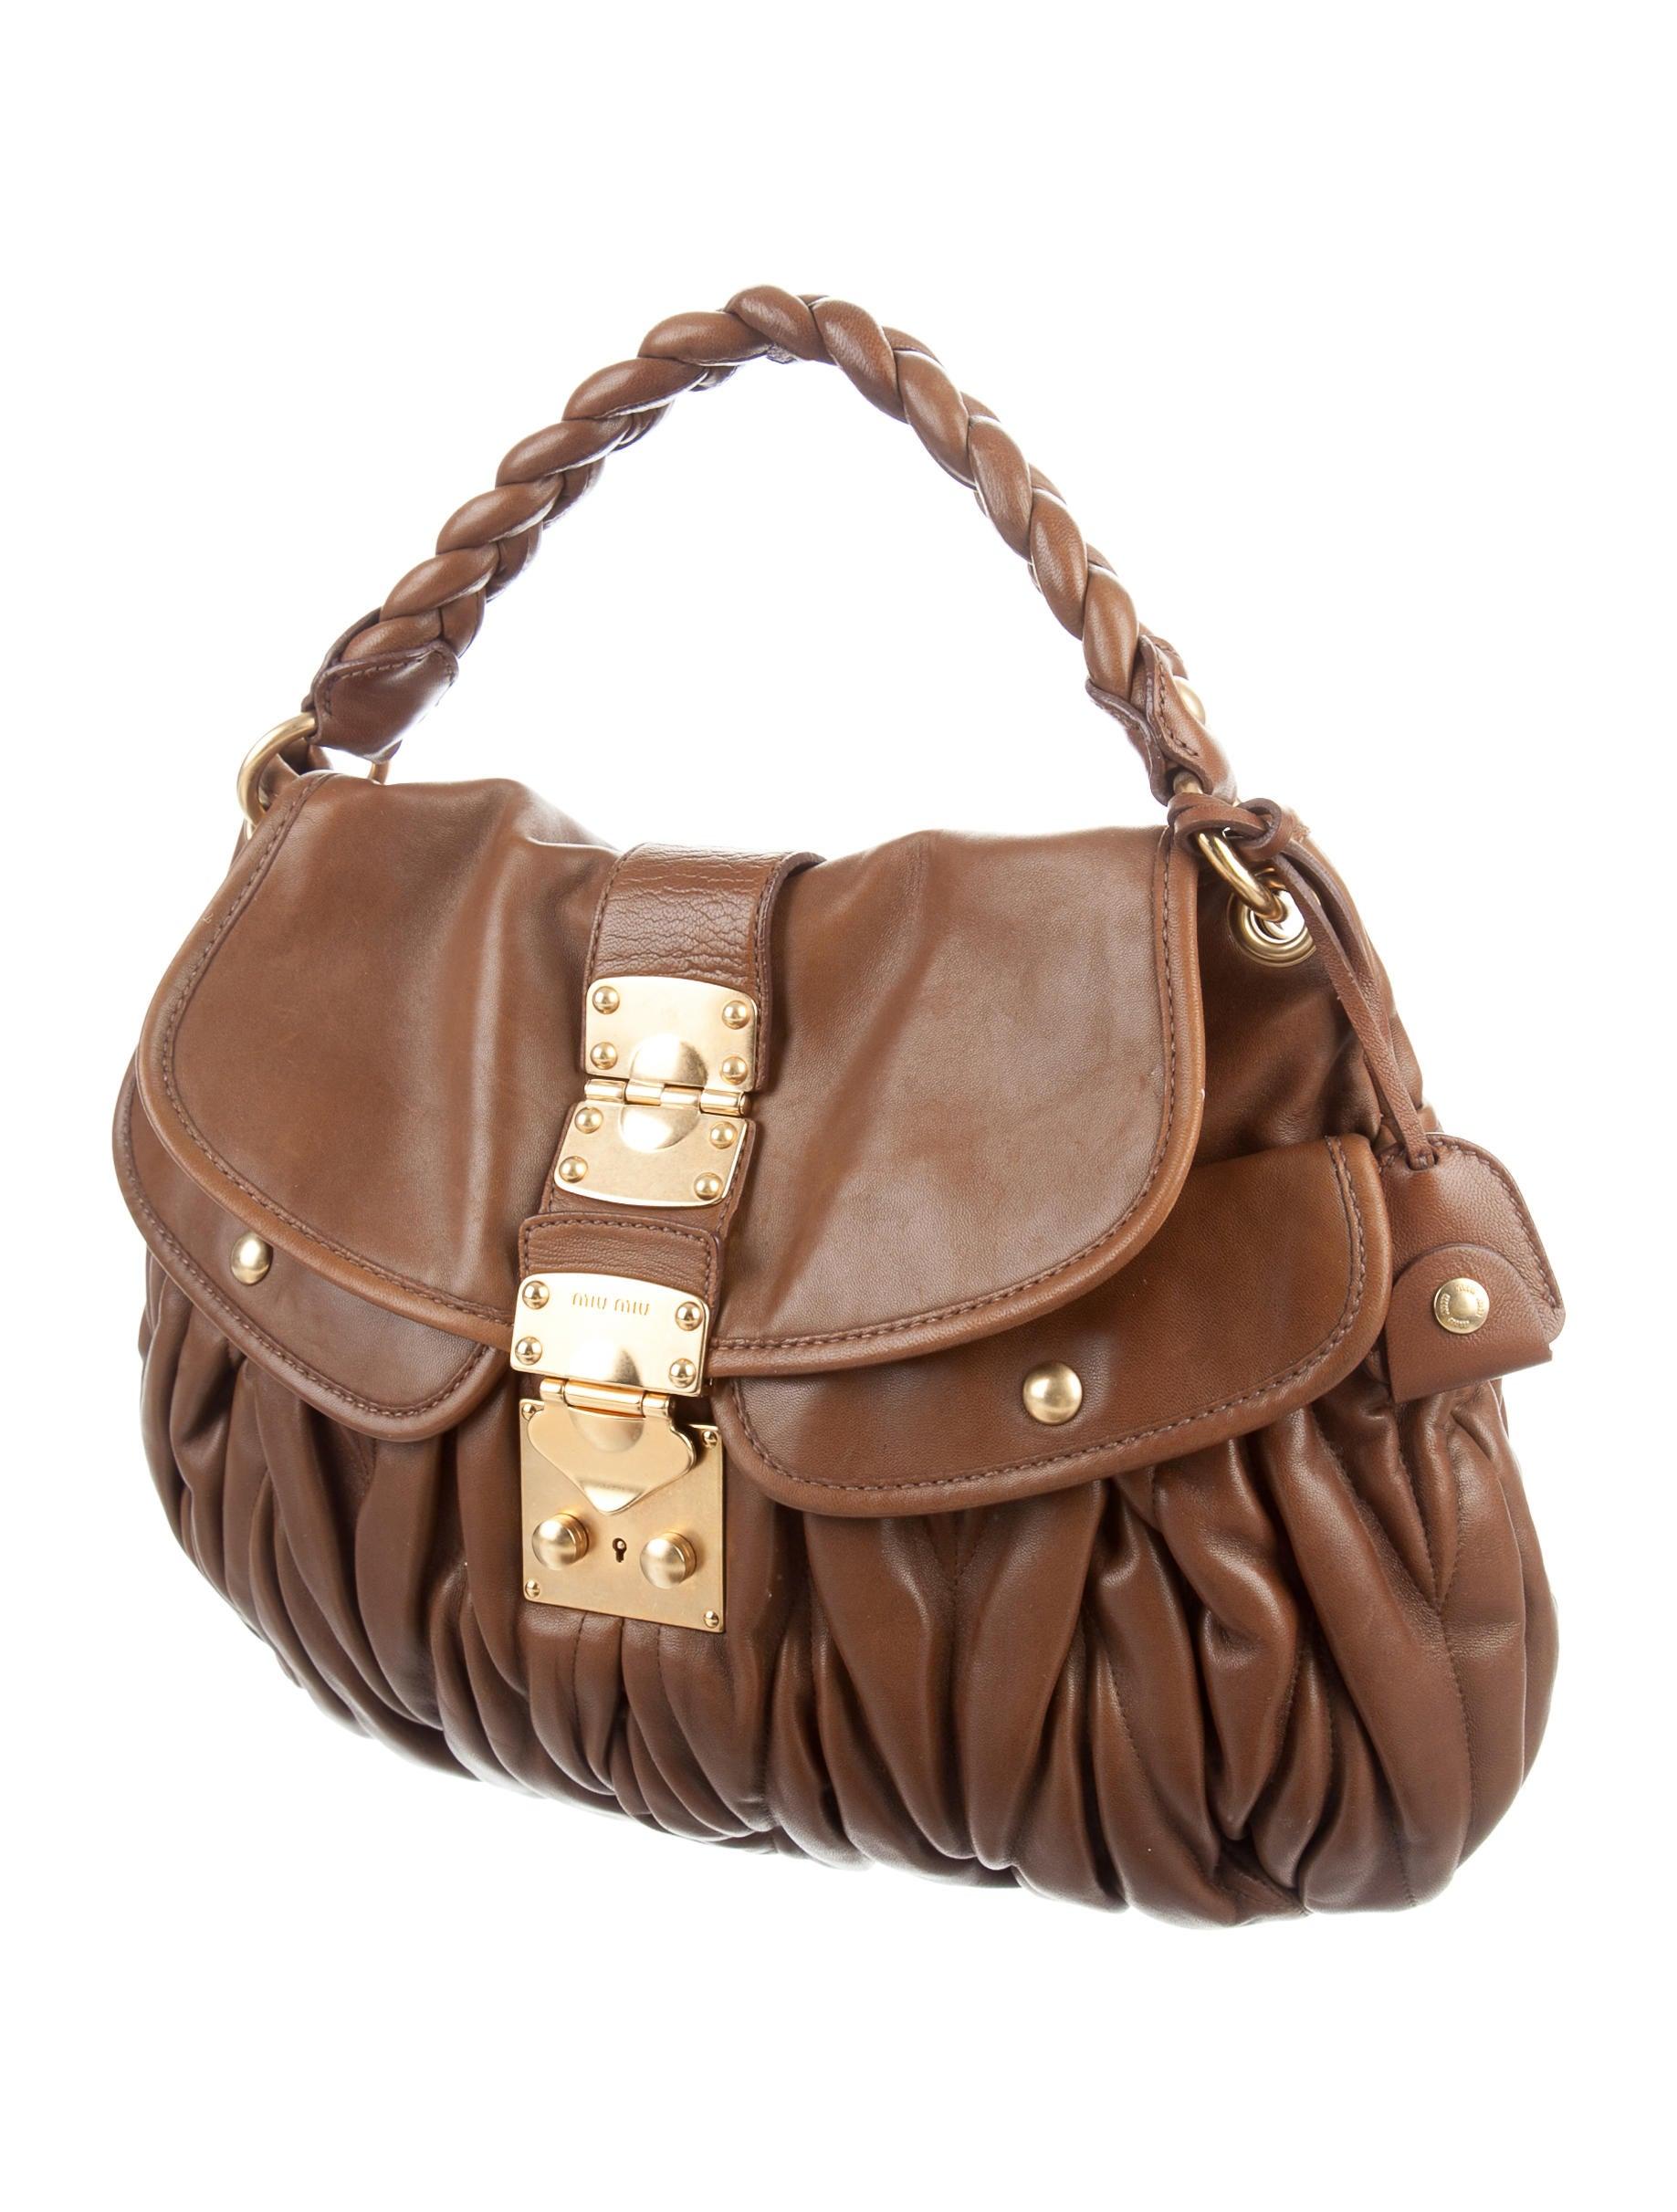 Miu Miu Leather Coffer Bag Handbags Miu45020 The